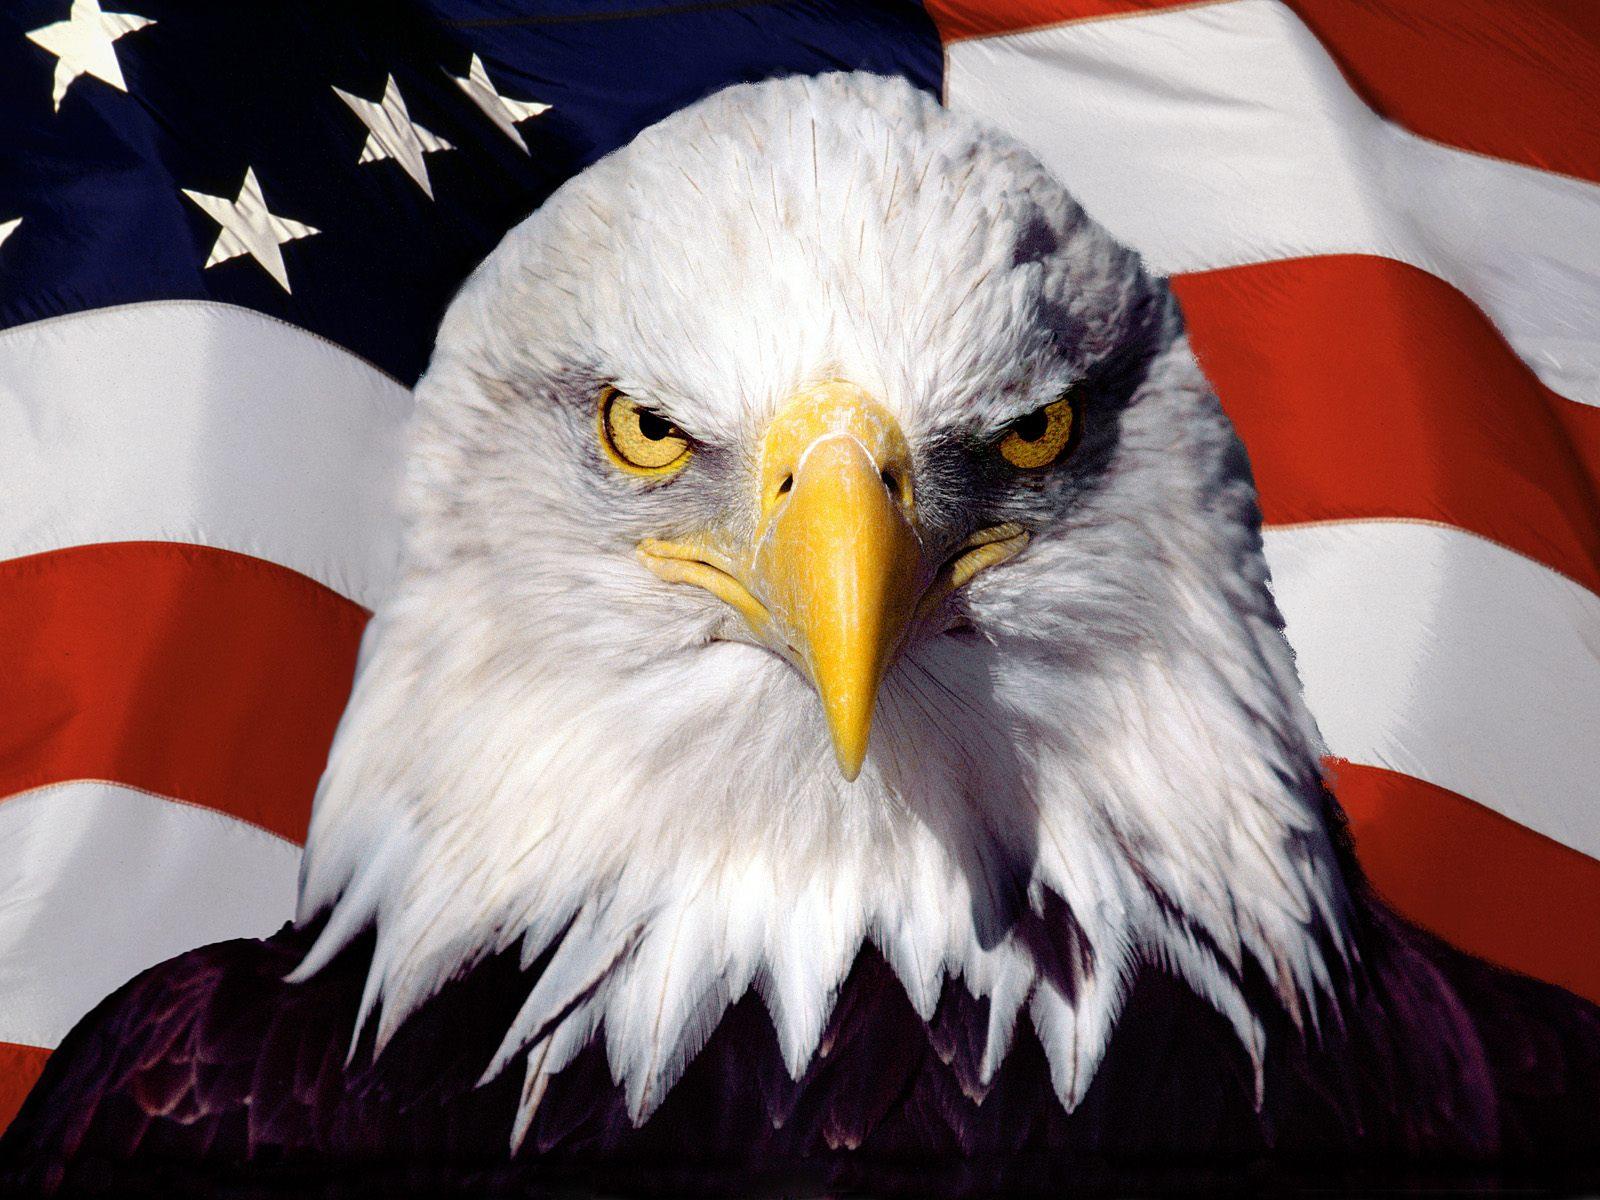 Flags American Patriot - Flags American Patriot